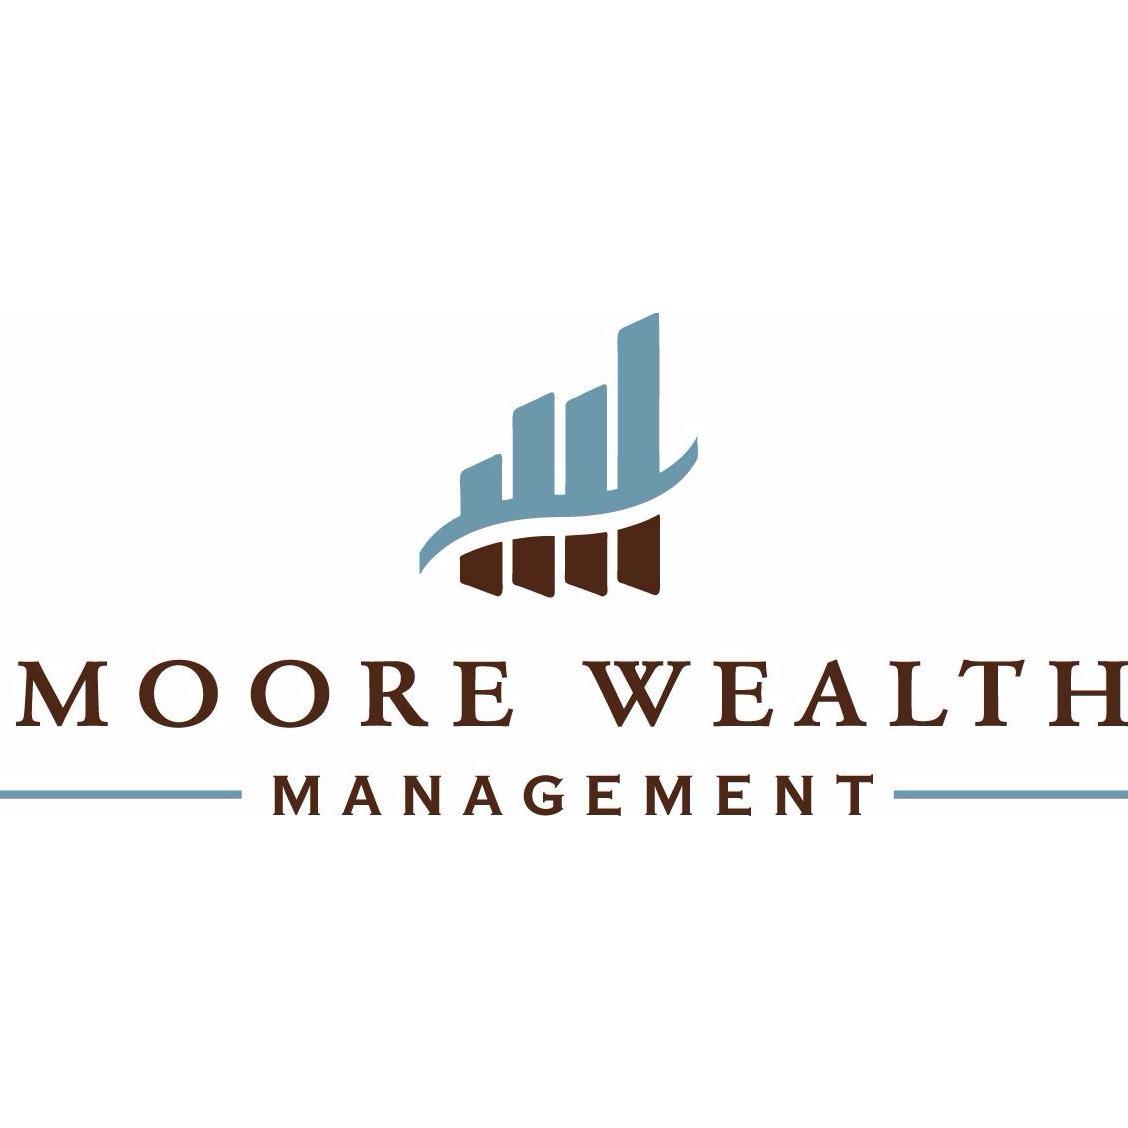 Moore Wealth Management, Inc.